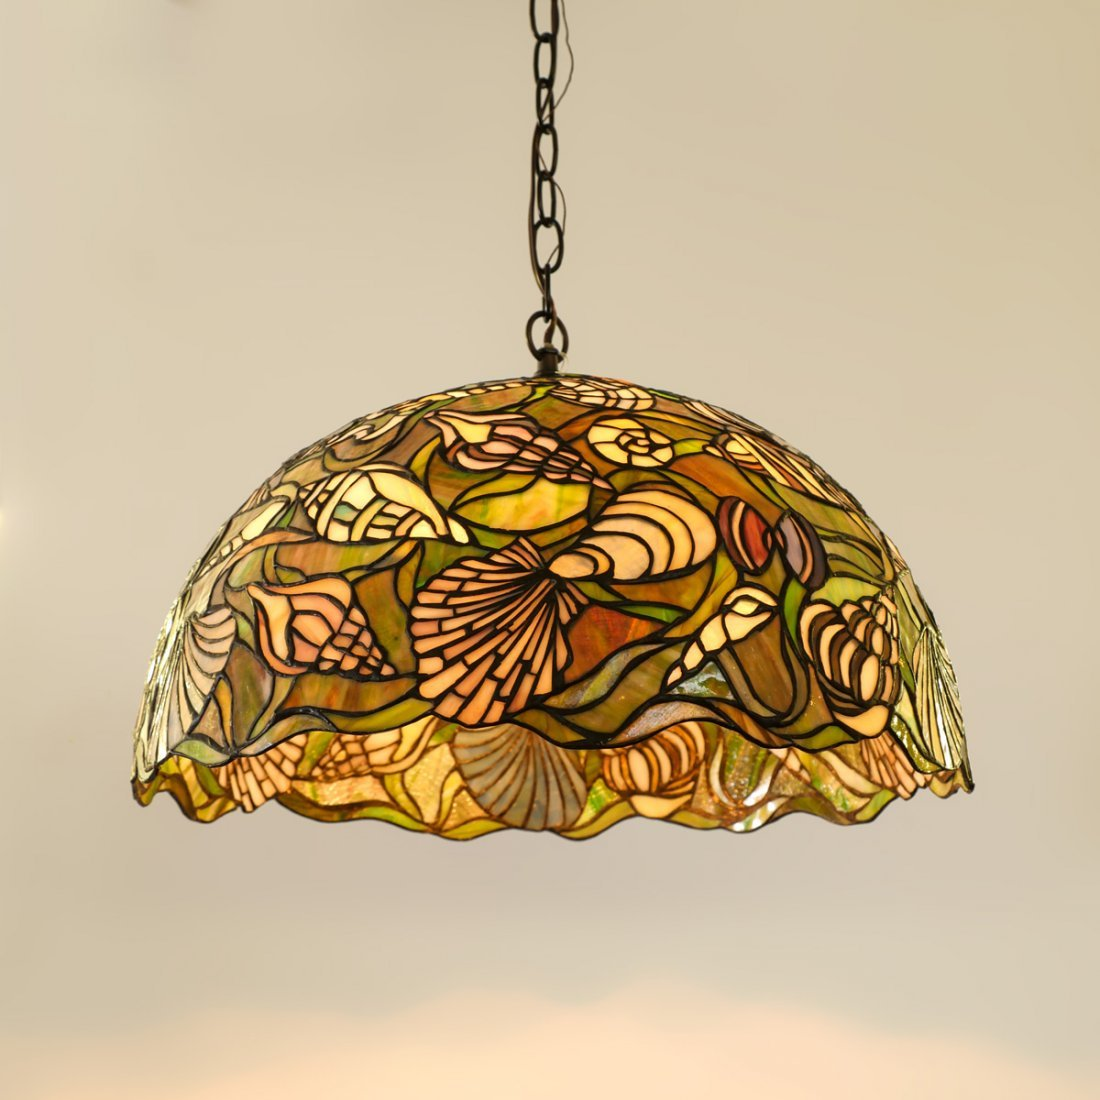 Details about Chandelier Meyda Tiffany 12 light, 32